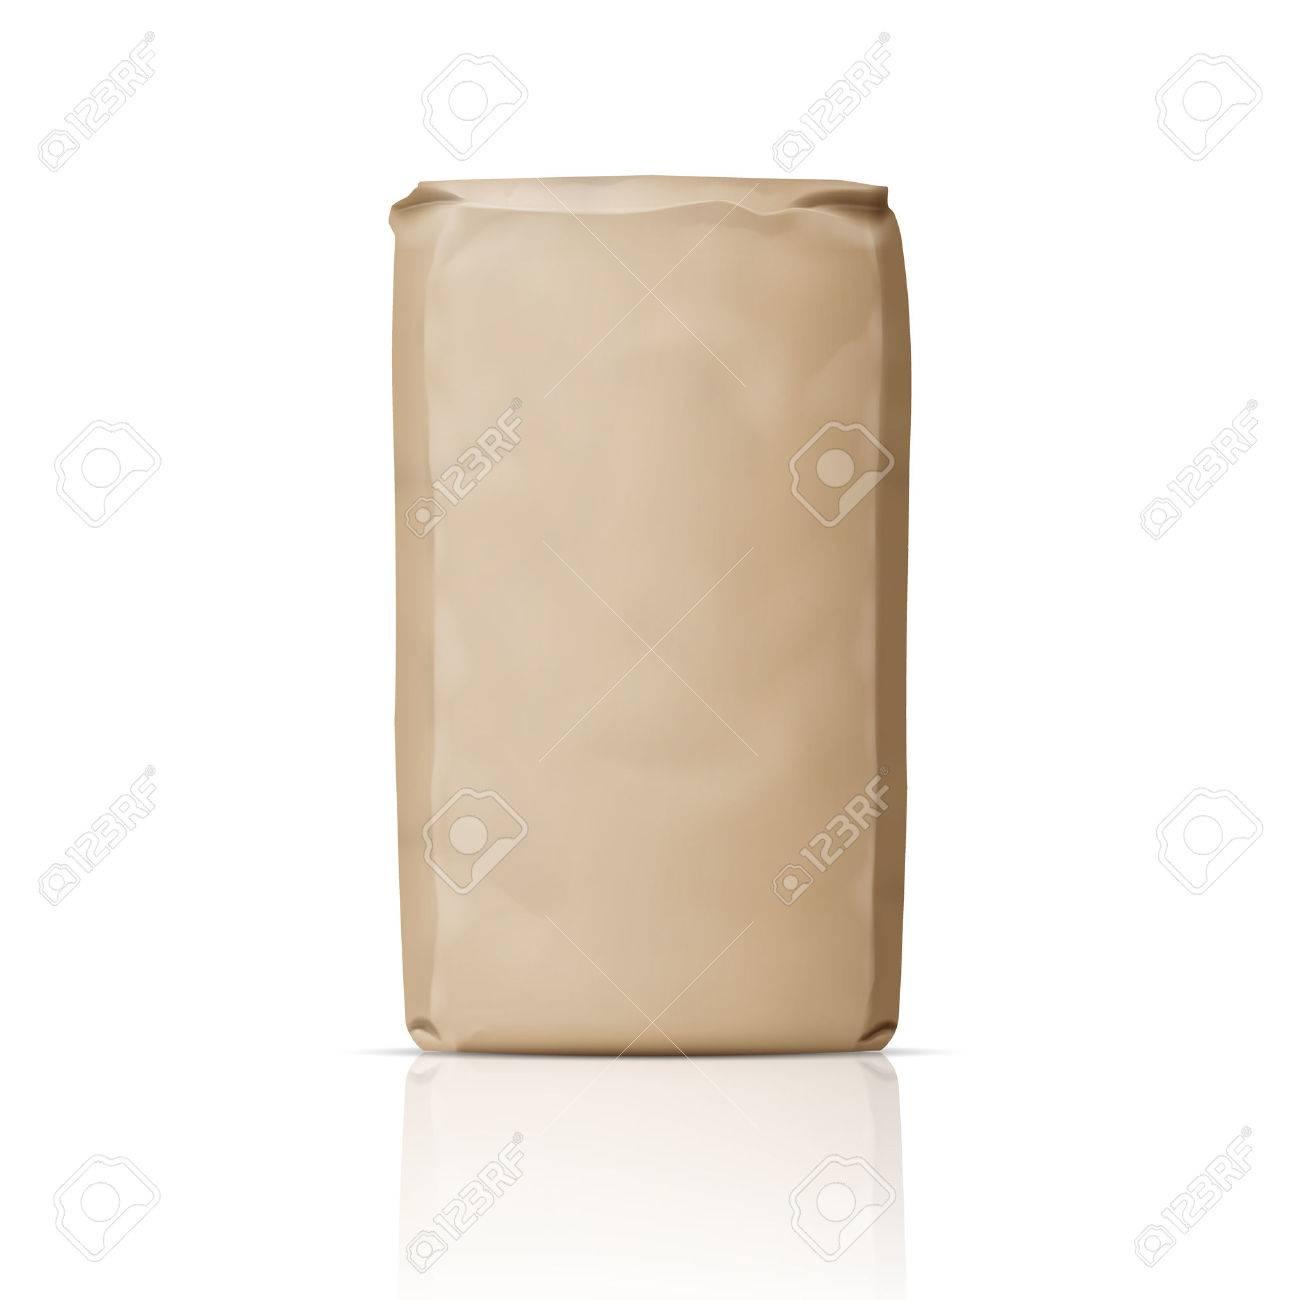 Blank brown paper bag for powder, sugar or flour. Vector illustration. - 53798482